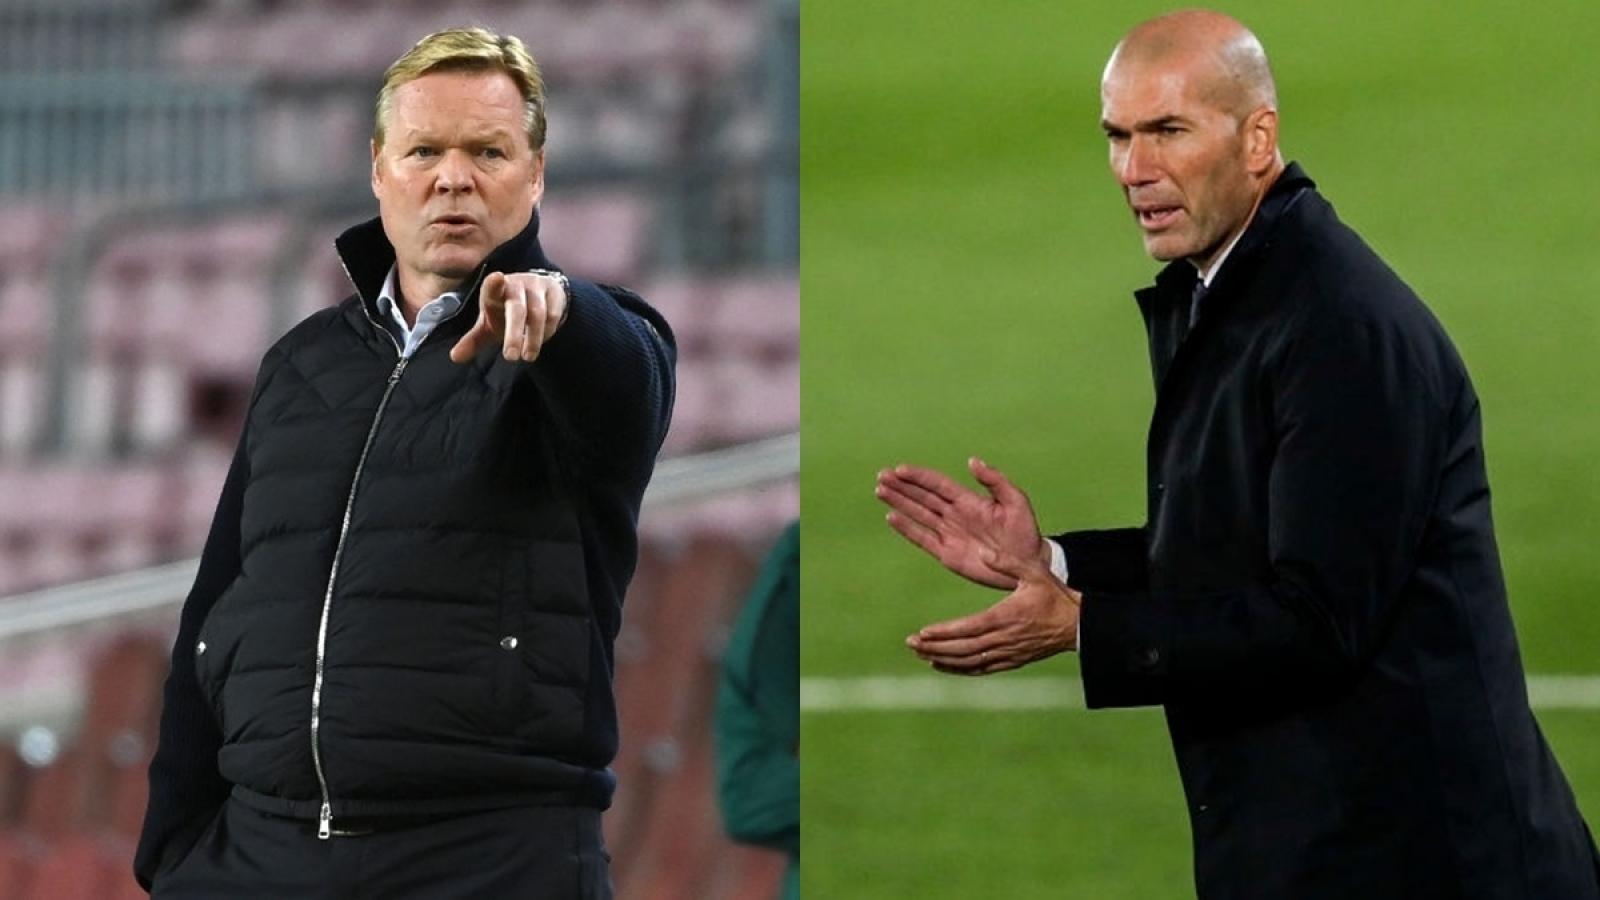 Vòng 10 La Liga 2020/2021: Zidane và Koeman đi trên dây